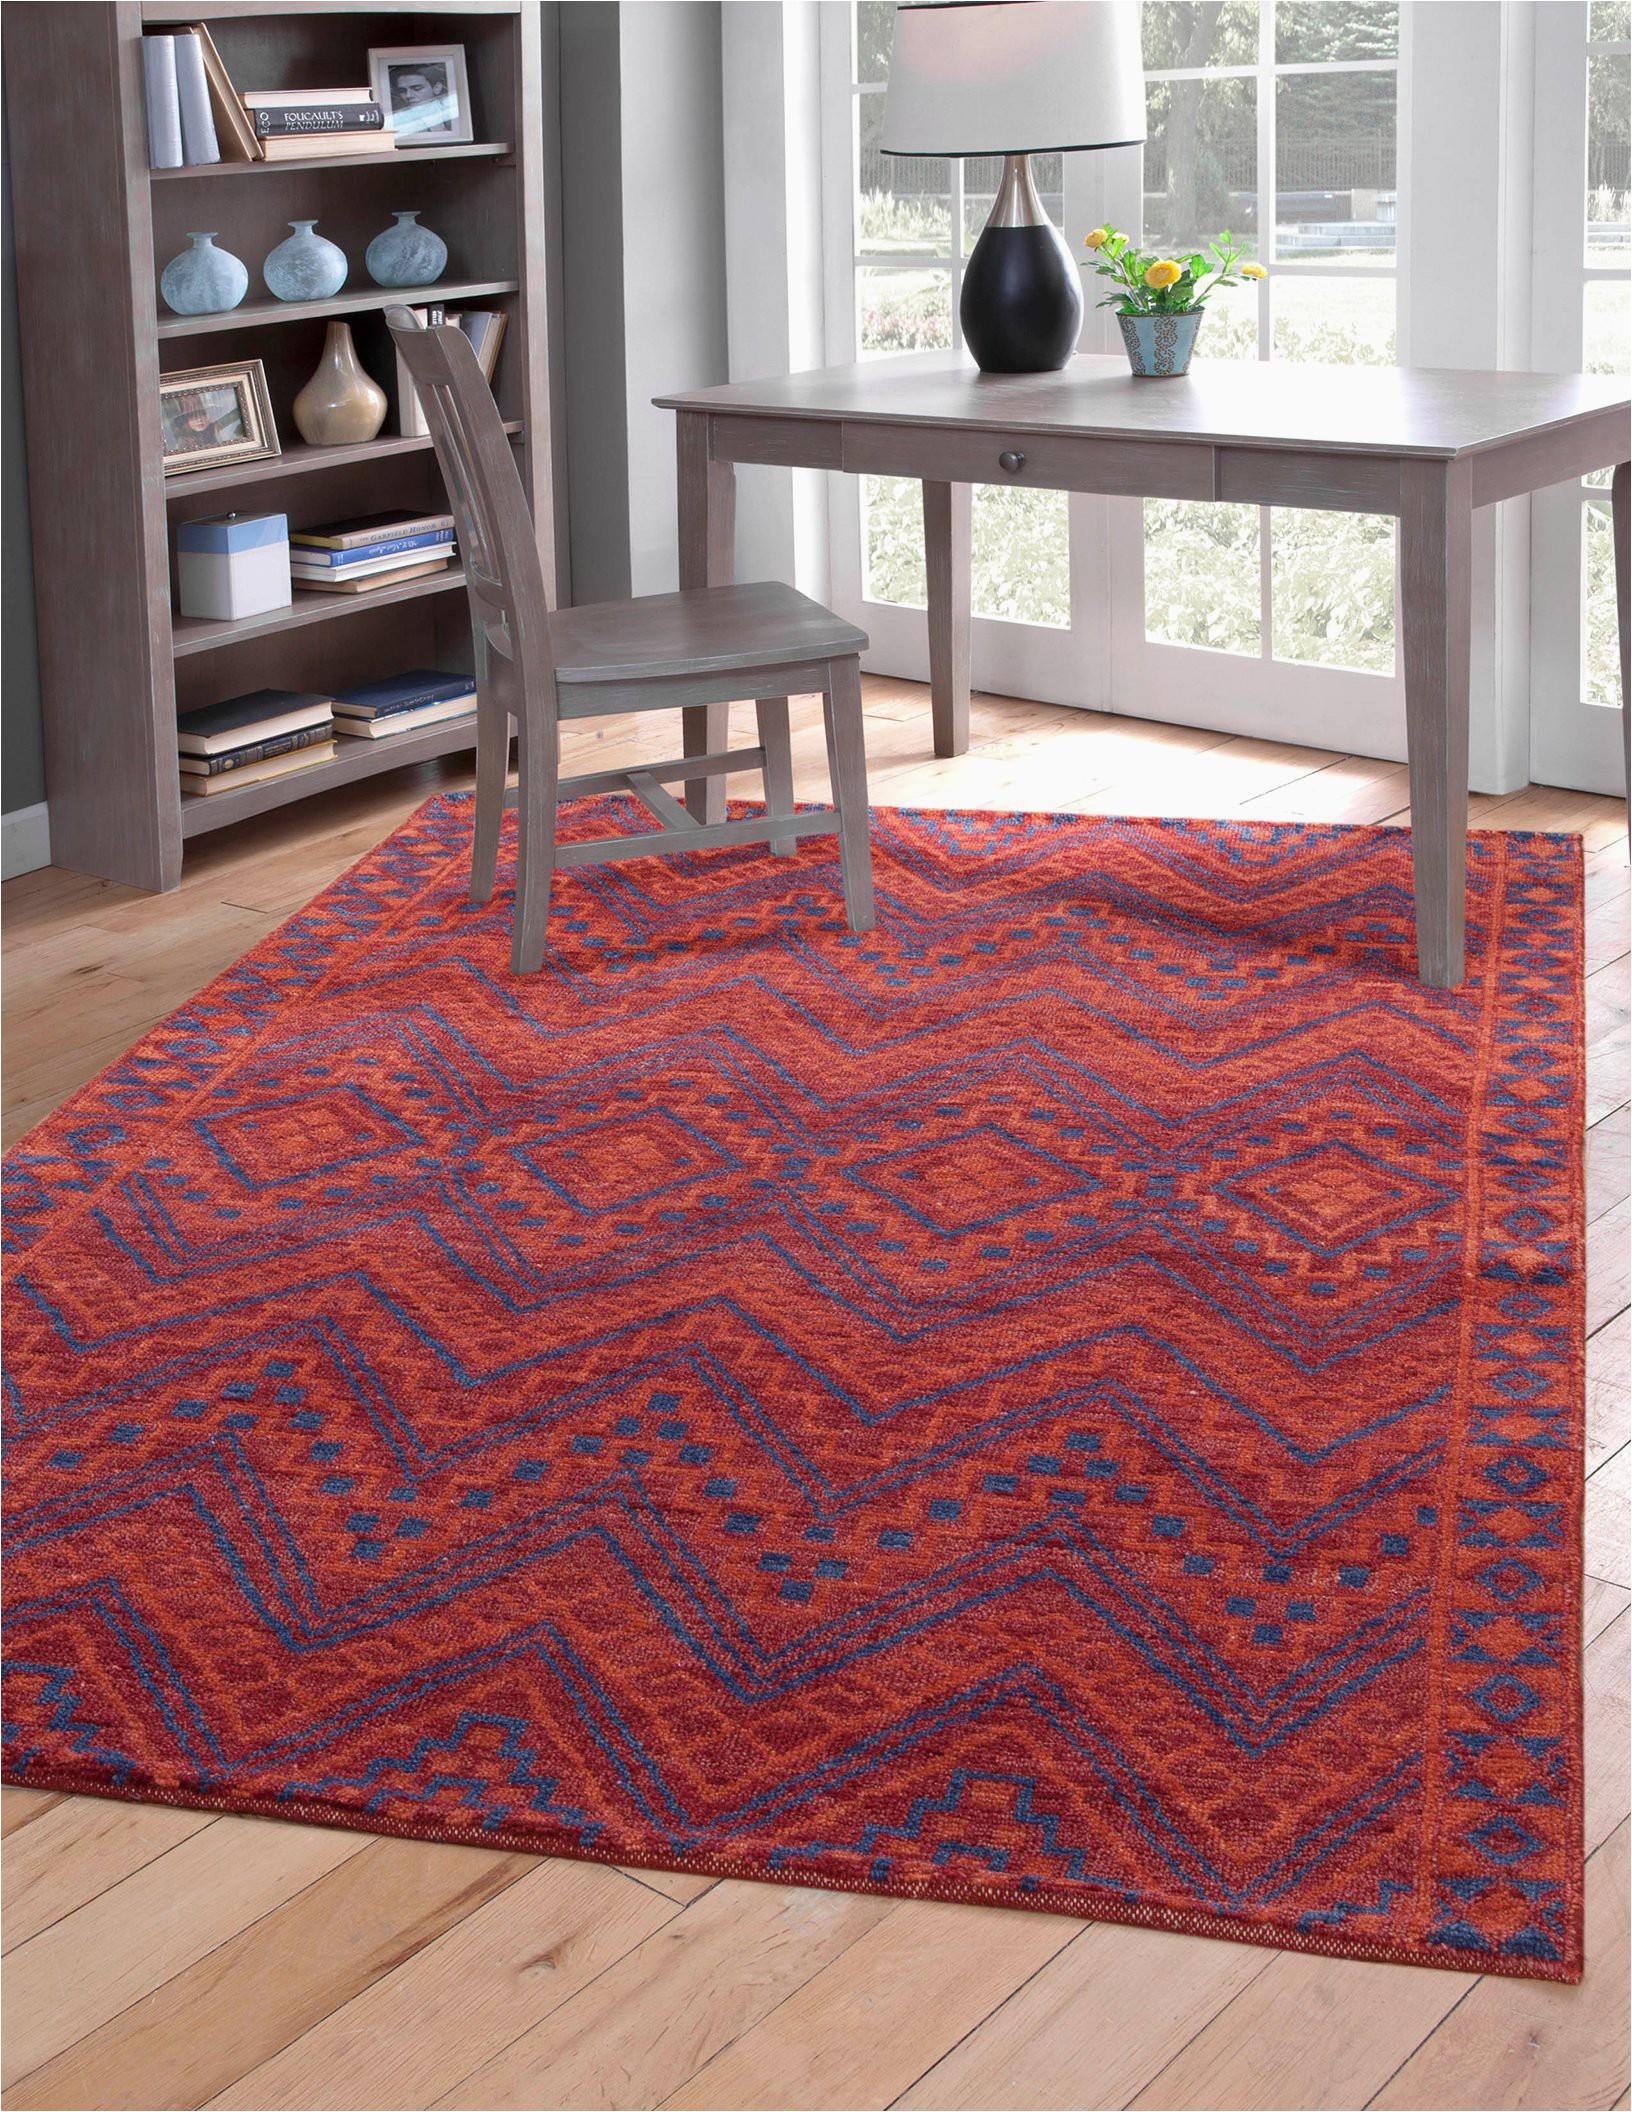 Red Orange and Blue Southwest Santa Fe Pattern Wool Area Rug 2048x